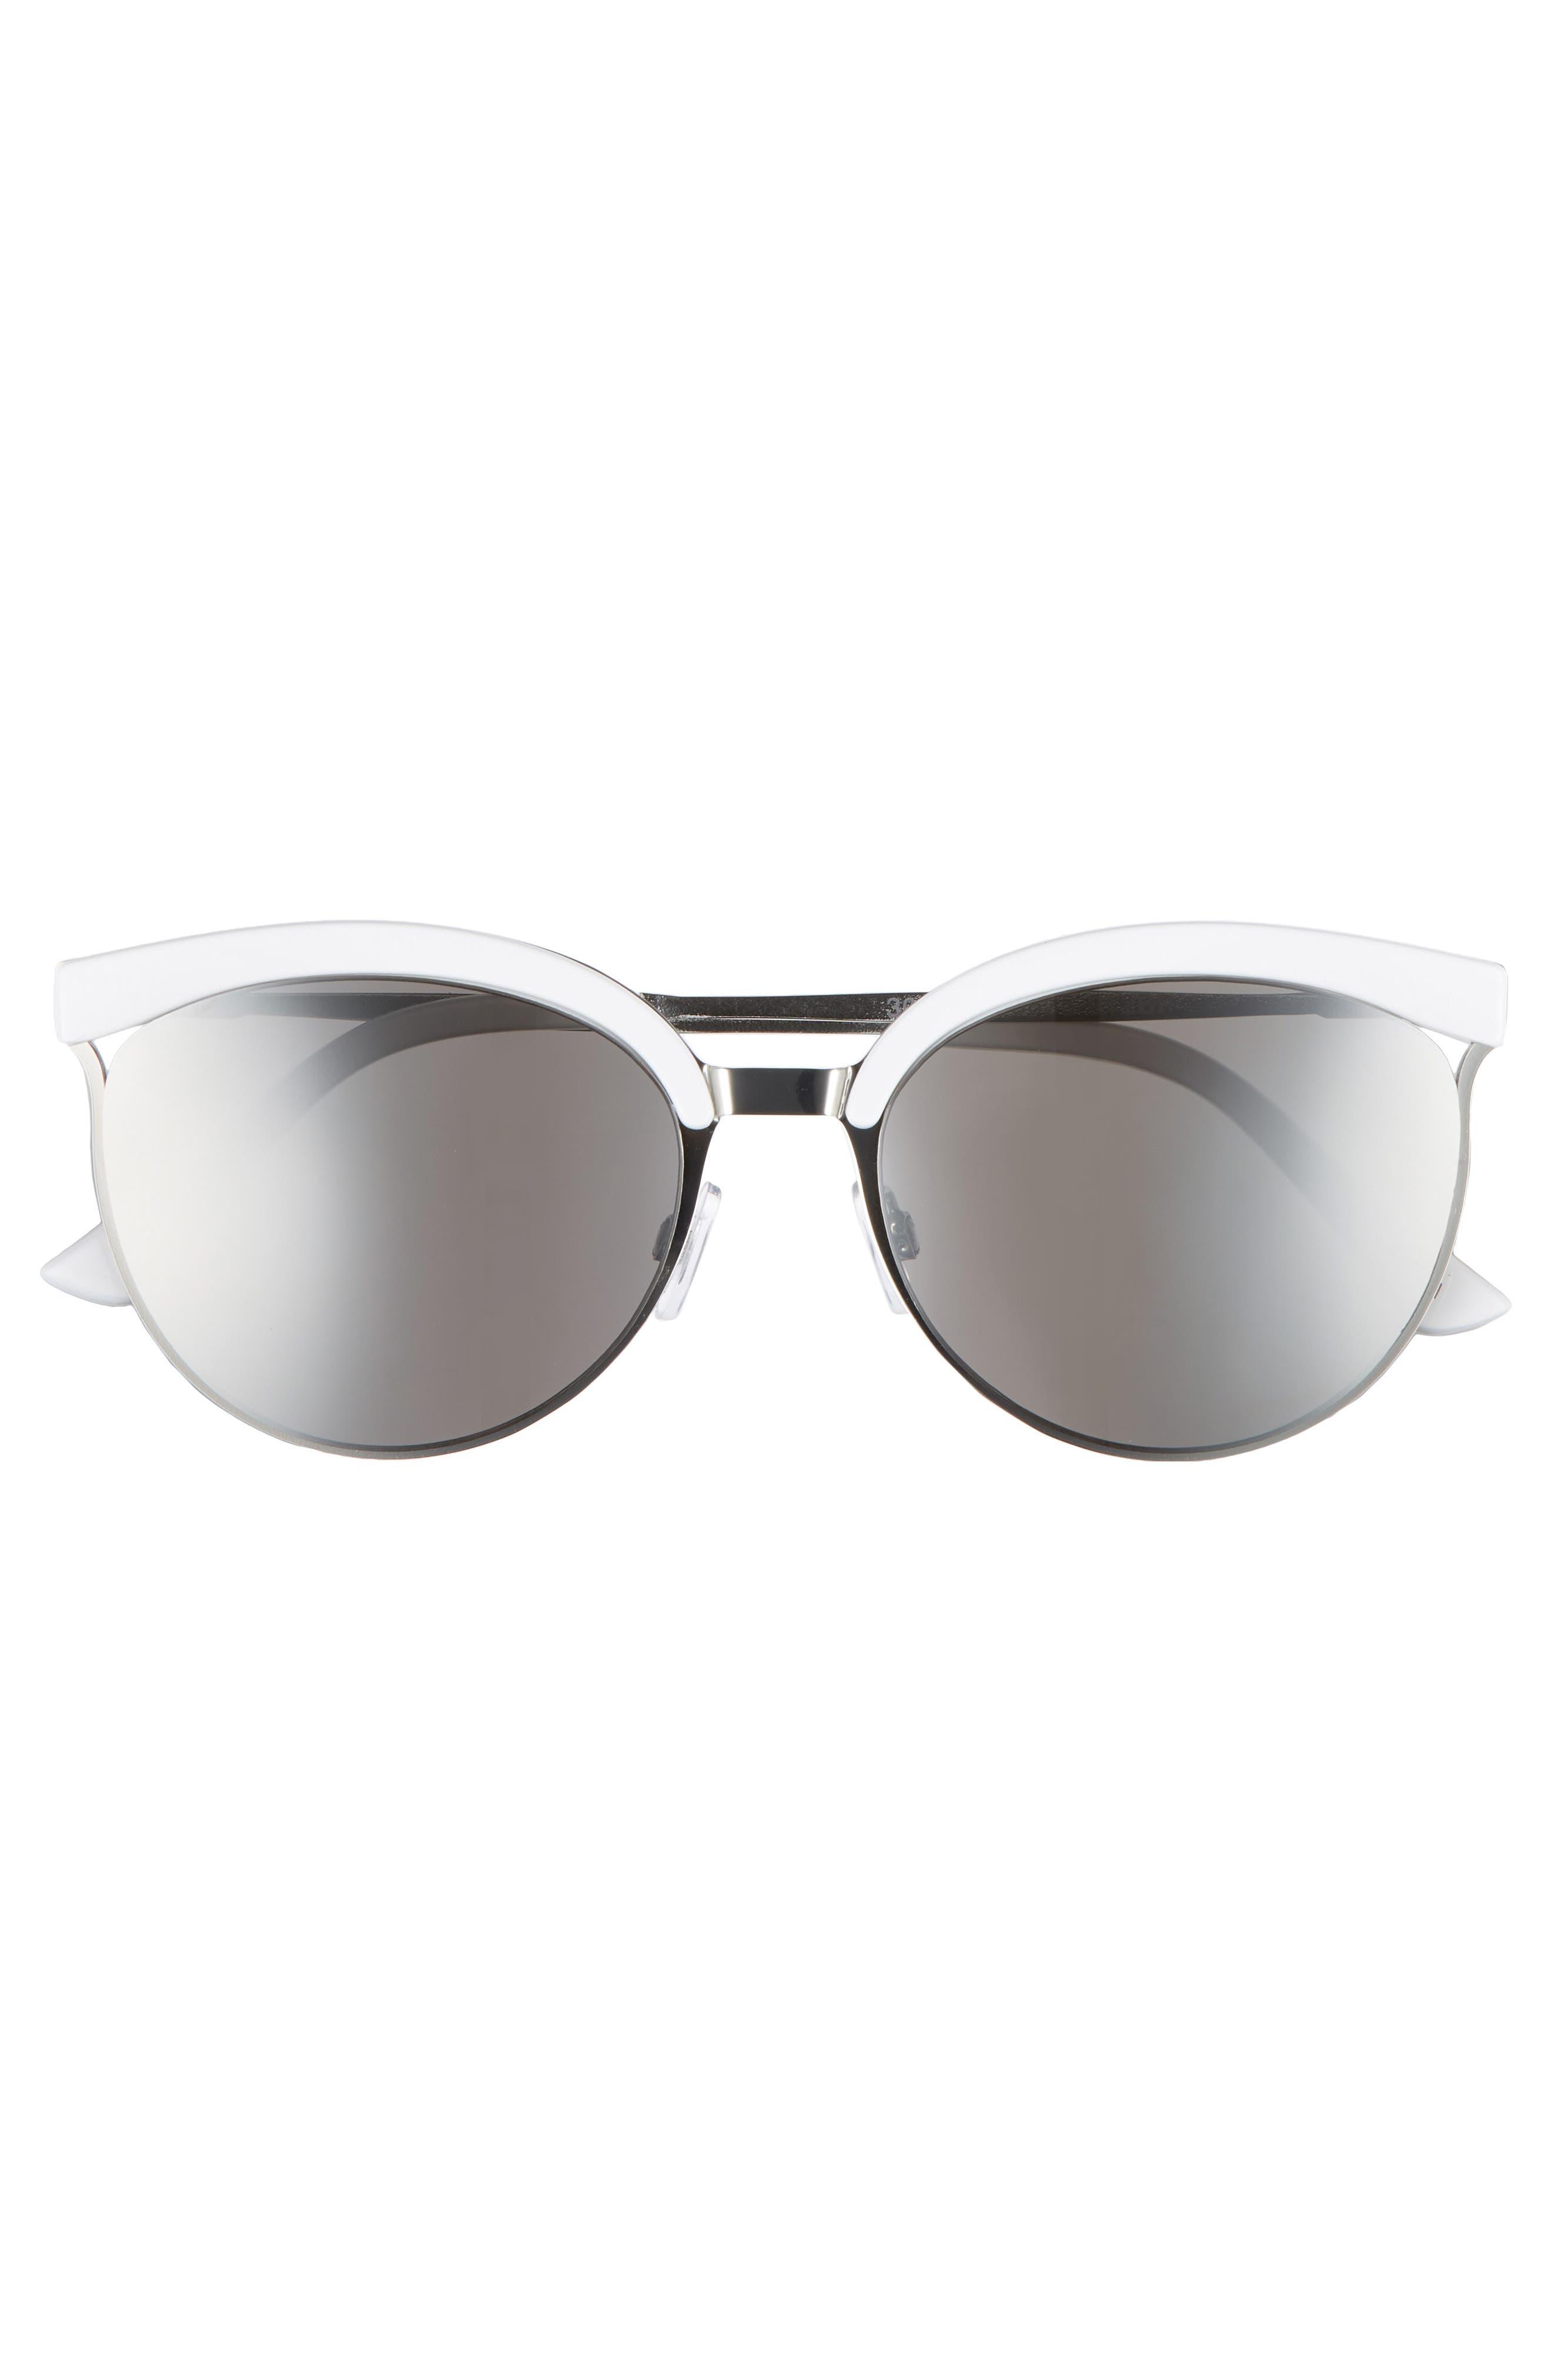 57mm Round Sunglasses,                             Alternate thumbnail 3, color,                             WHITE/ SILVER